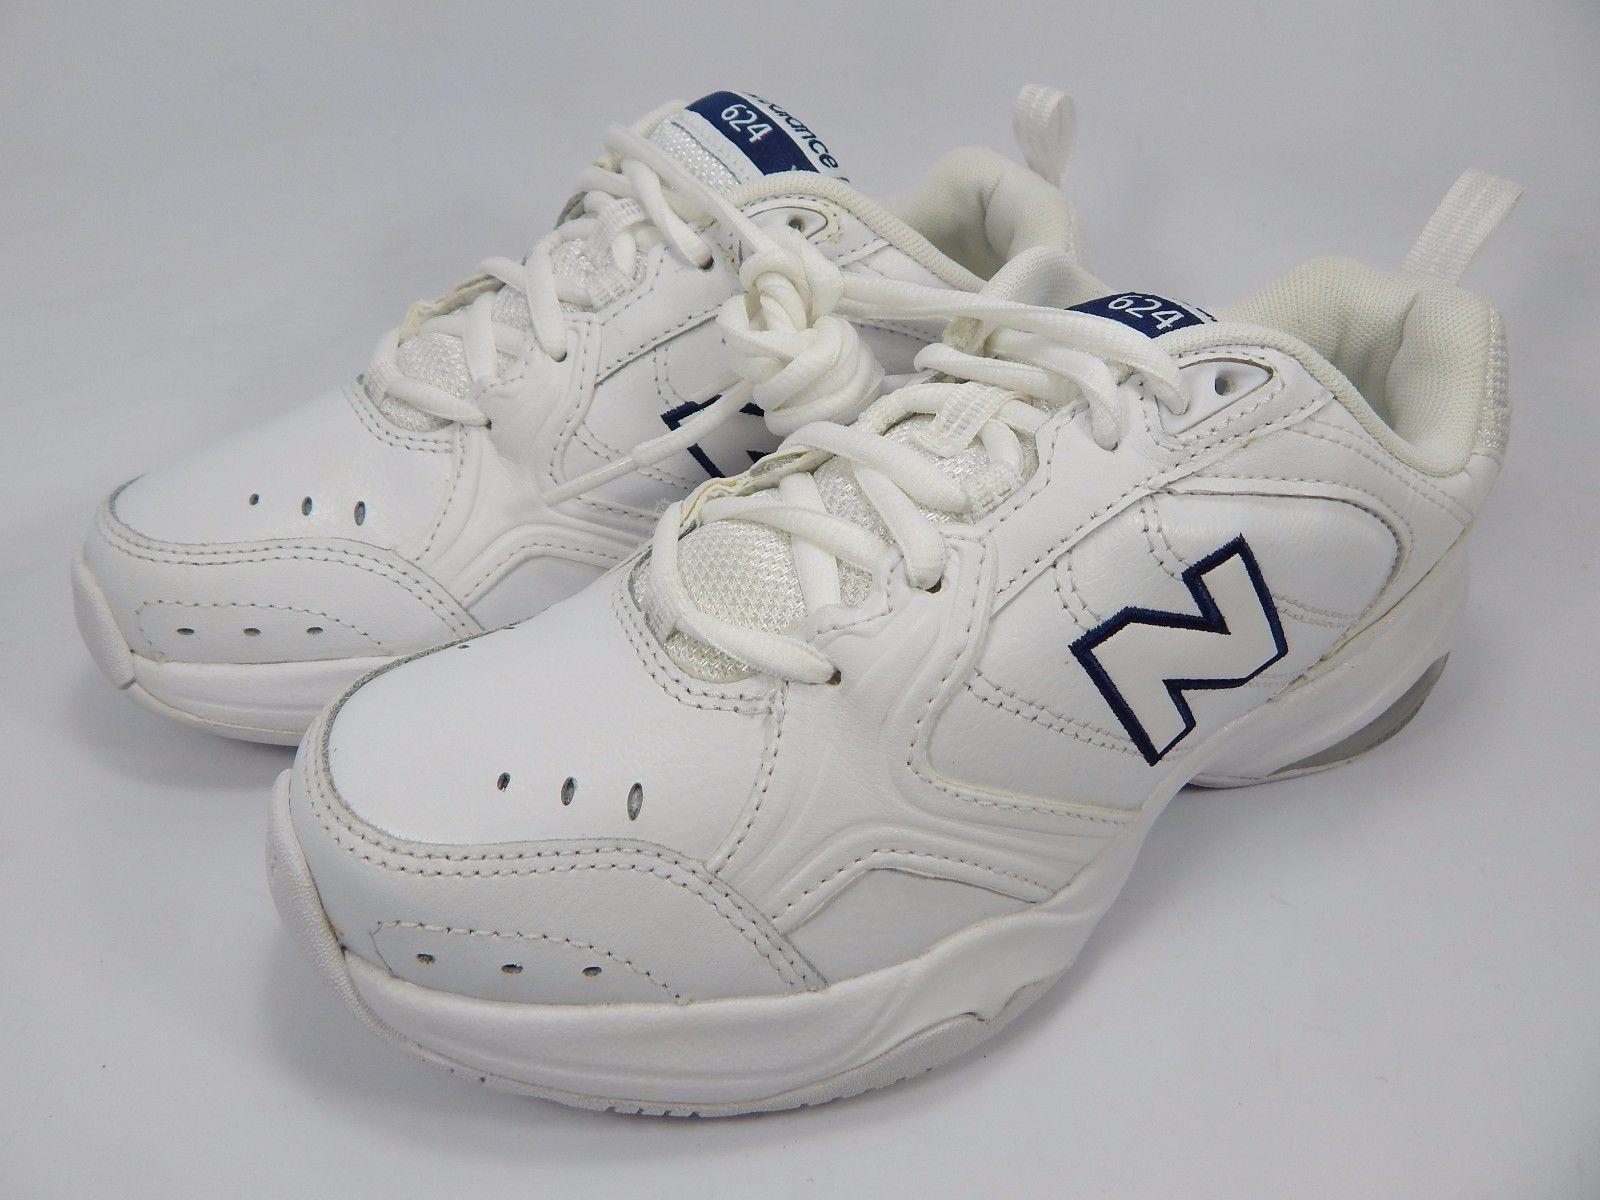 New Balance 624 v2 Women's Cross Training Shoes Sz US 7 D WIDE EU 37.5 WX624WT2